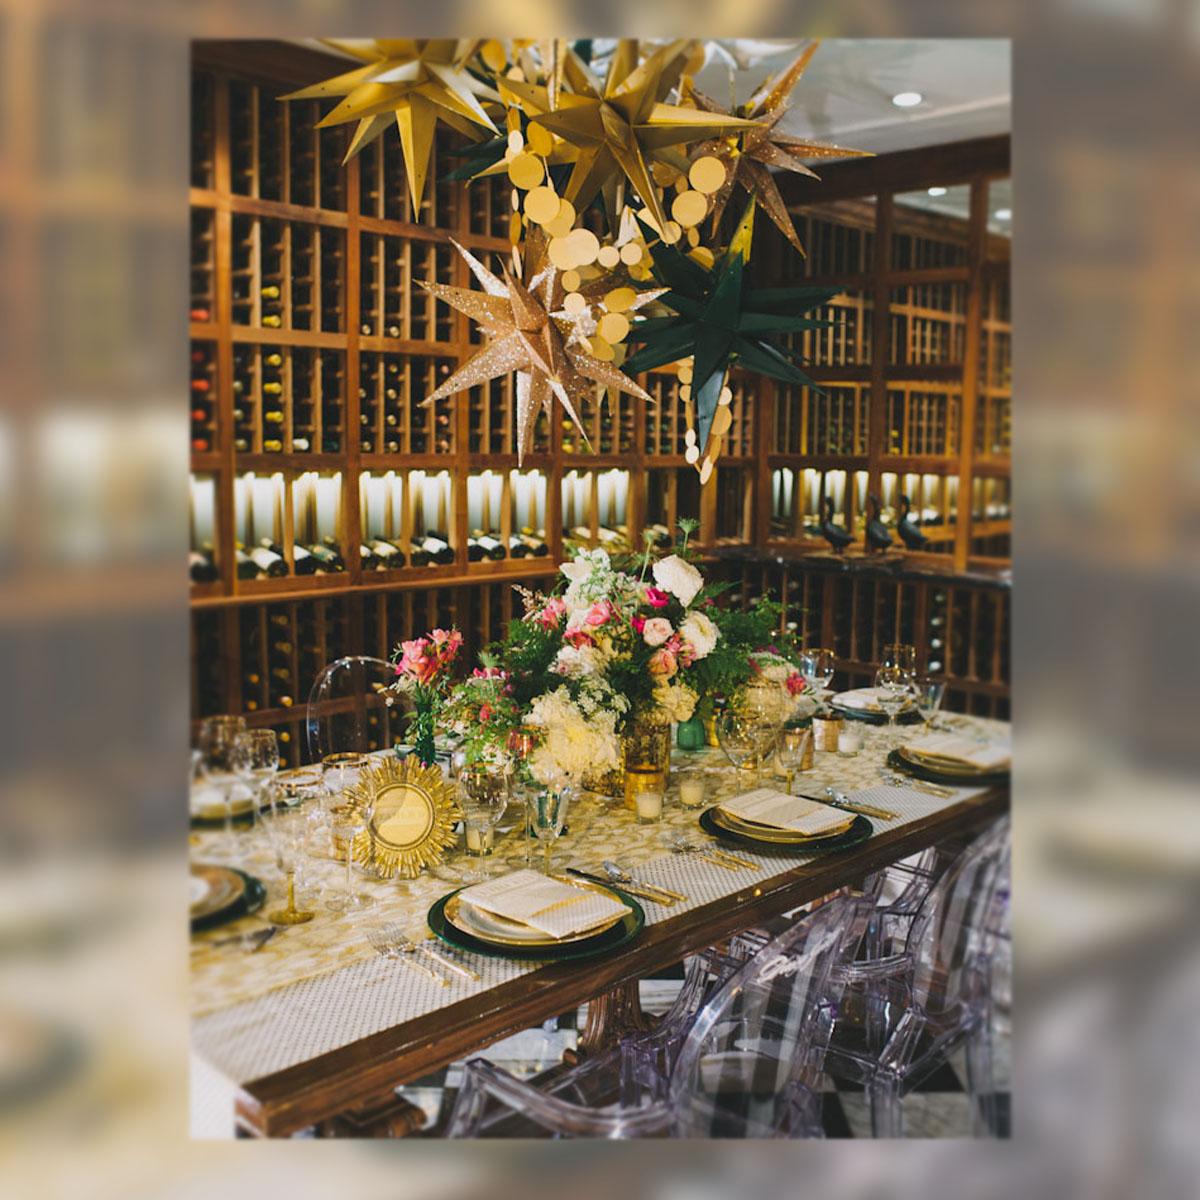 Decoracion boda a os 20 boda gatsby la musa decoraci n for Decoracion anos 20